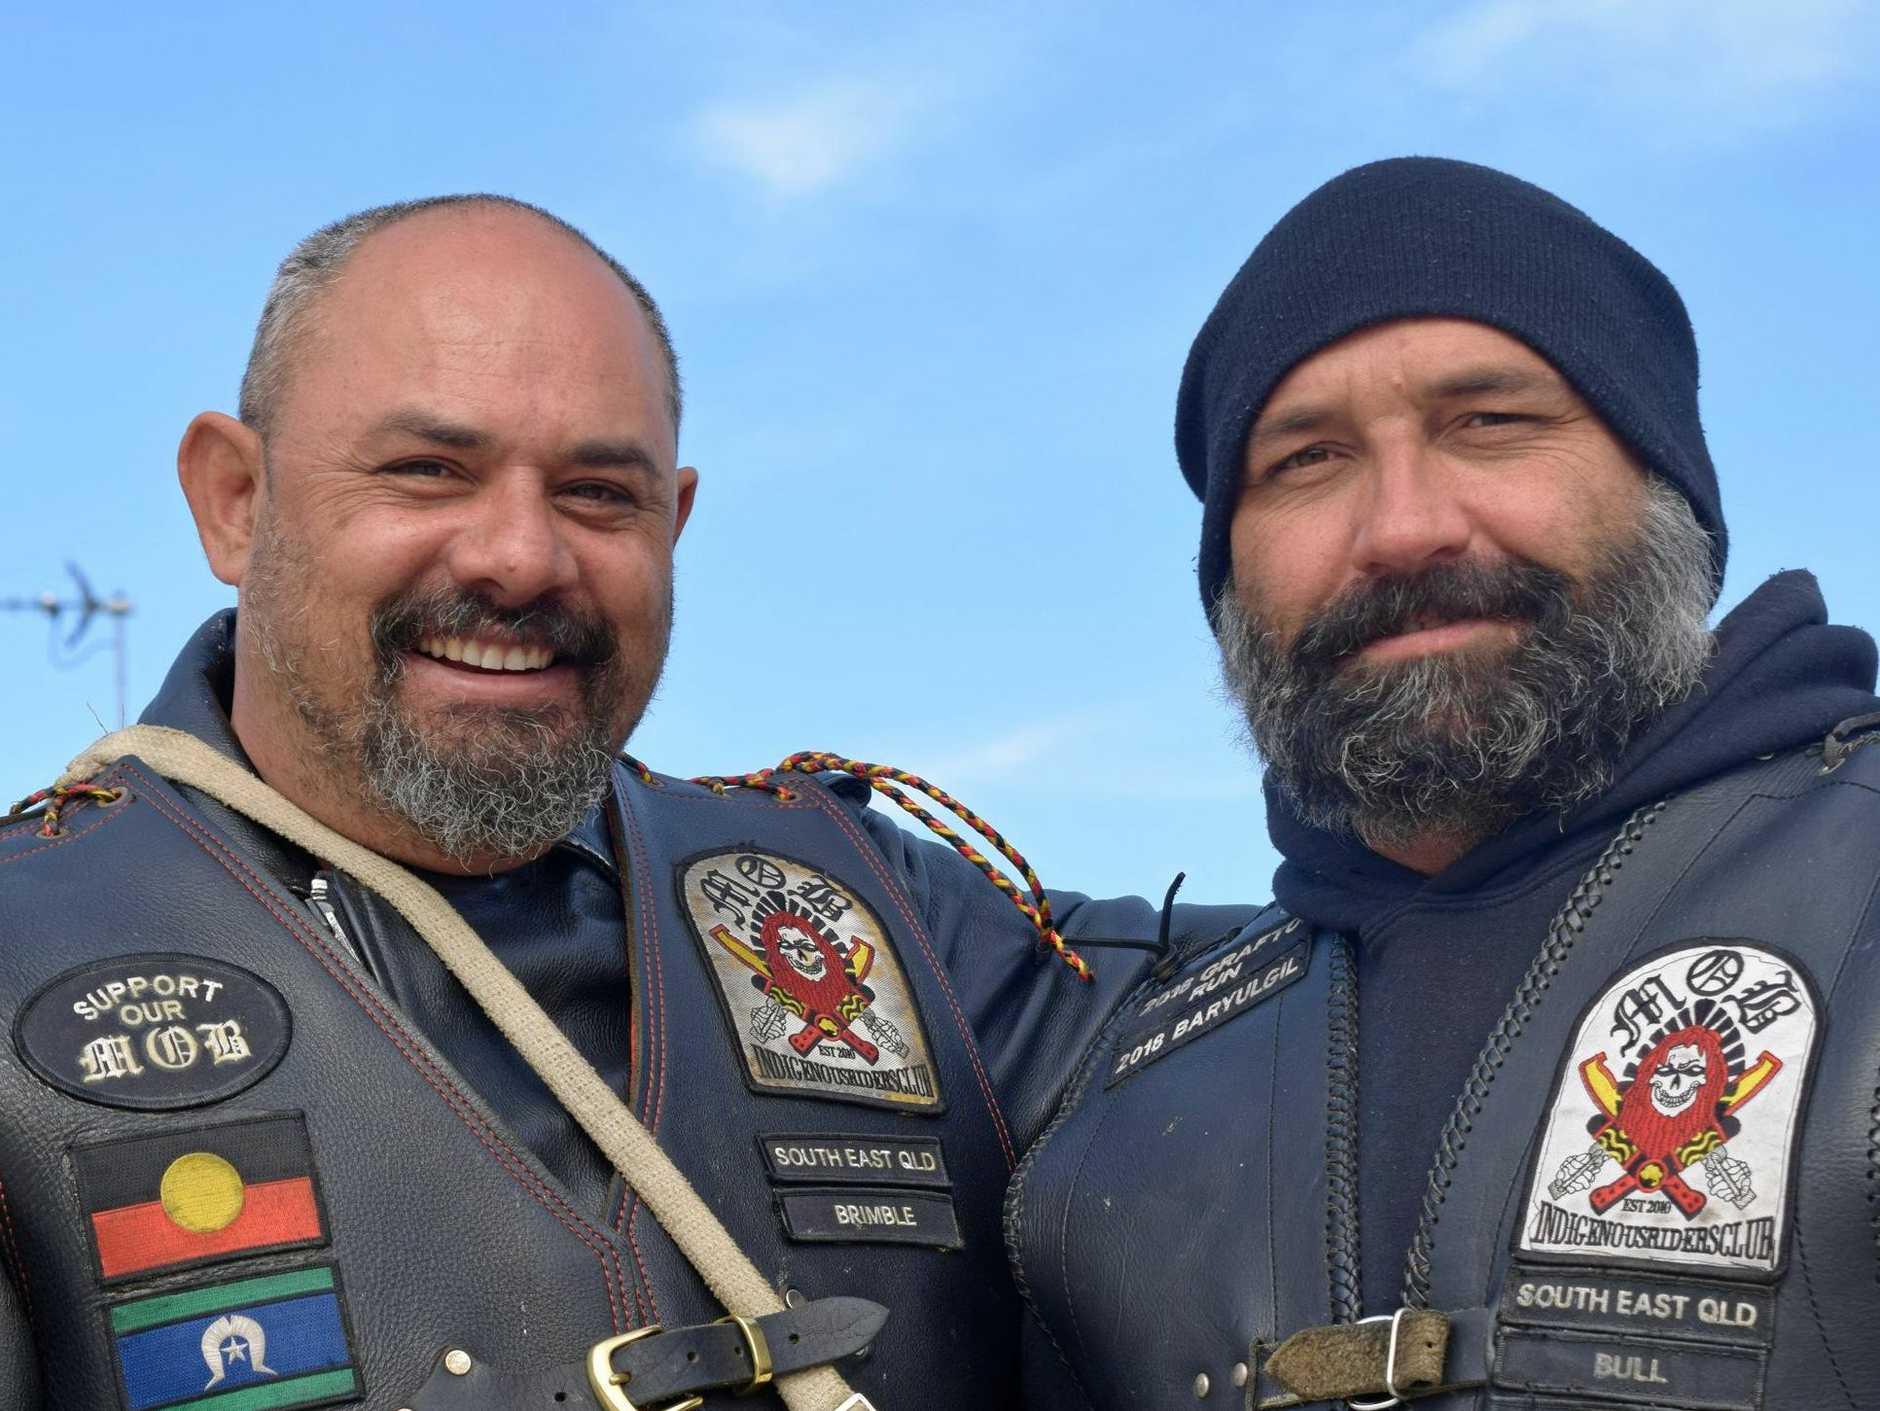 BROTHERHOOD: Mark Brimble and Damian Beetson of the 'Murries on Bikes' group.